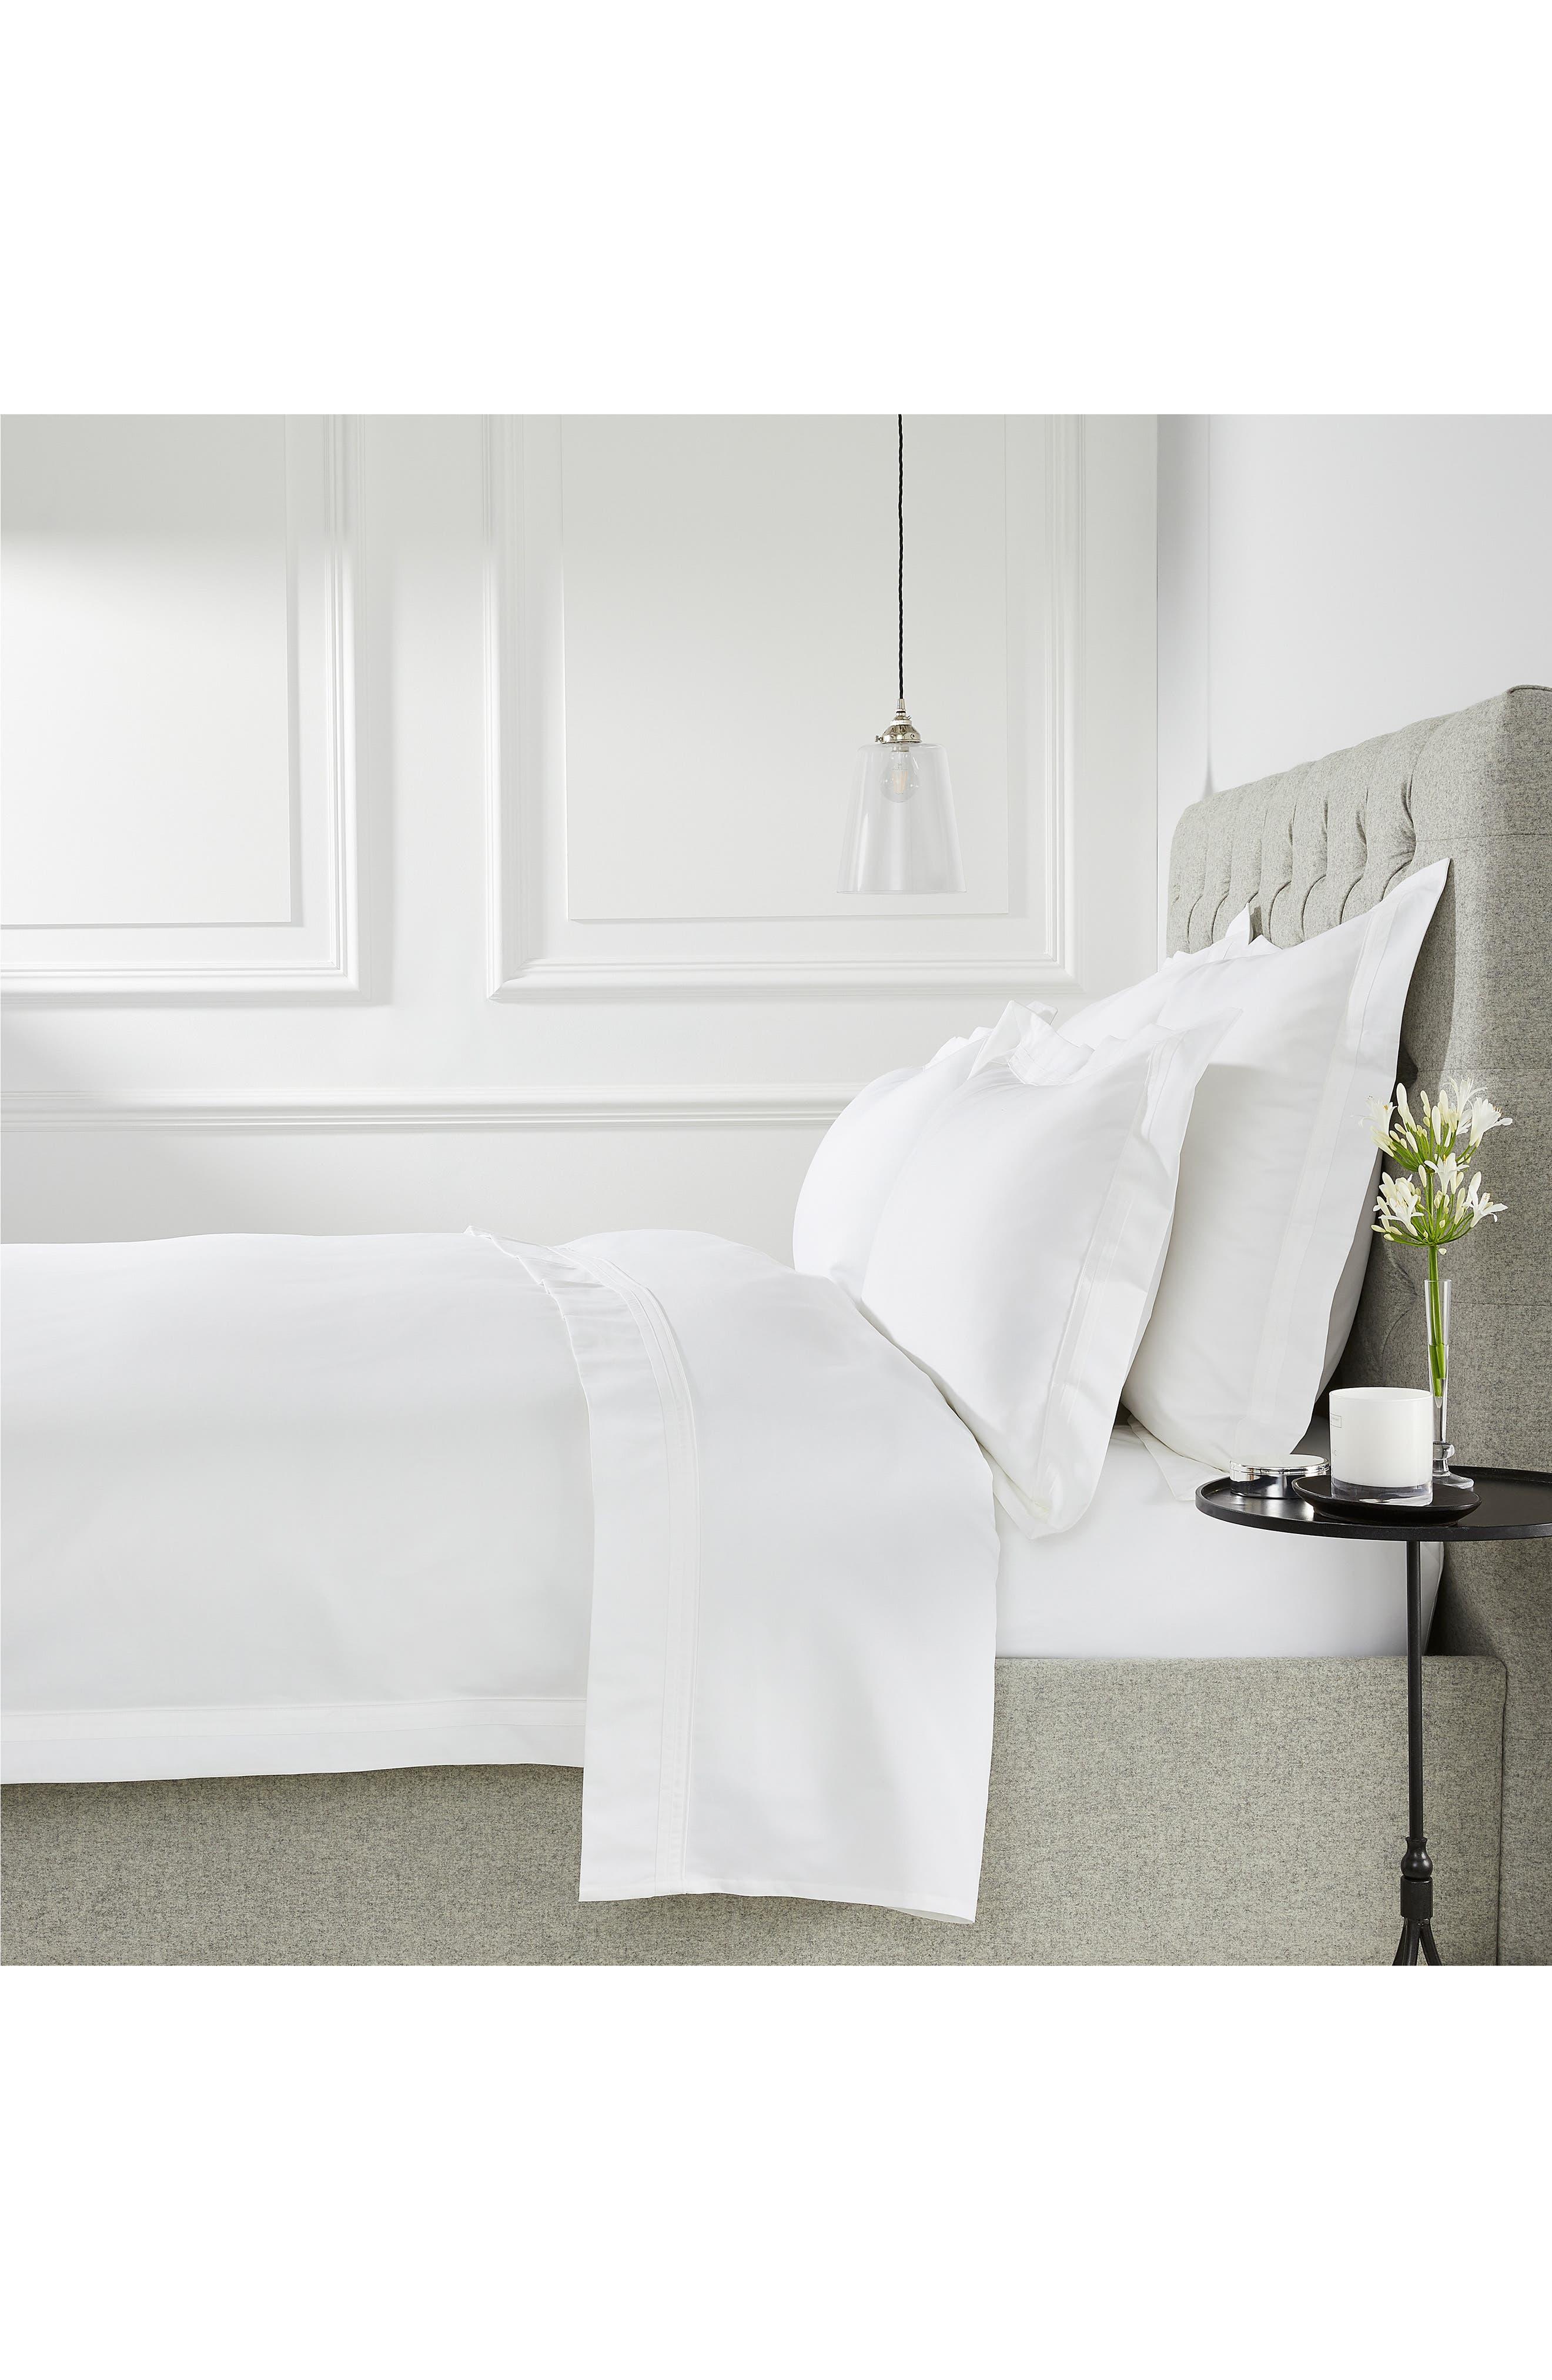 THE WHITE COMPANY Cavendish Duvet Cover, Main, color, WHITE